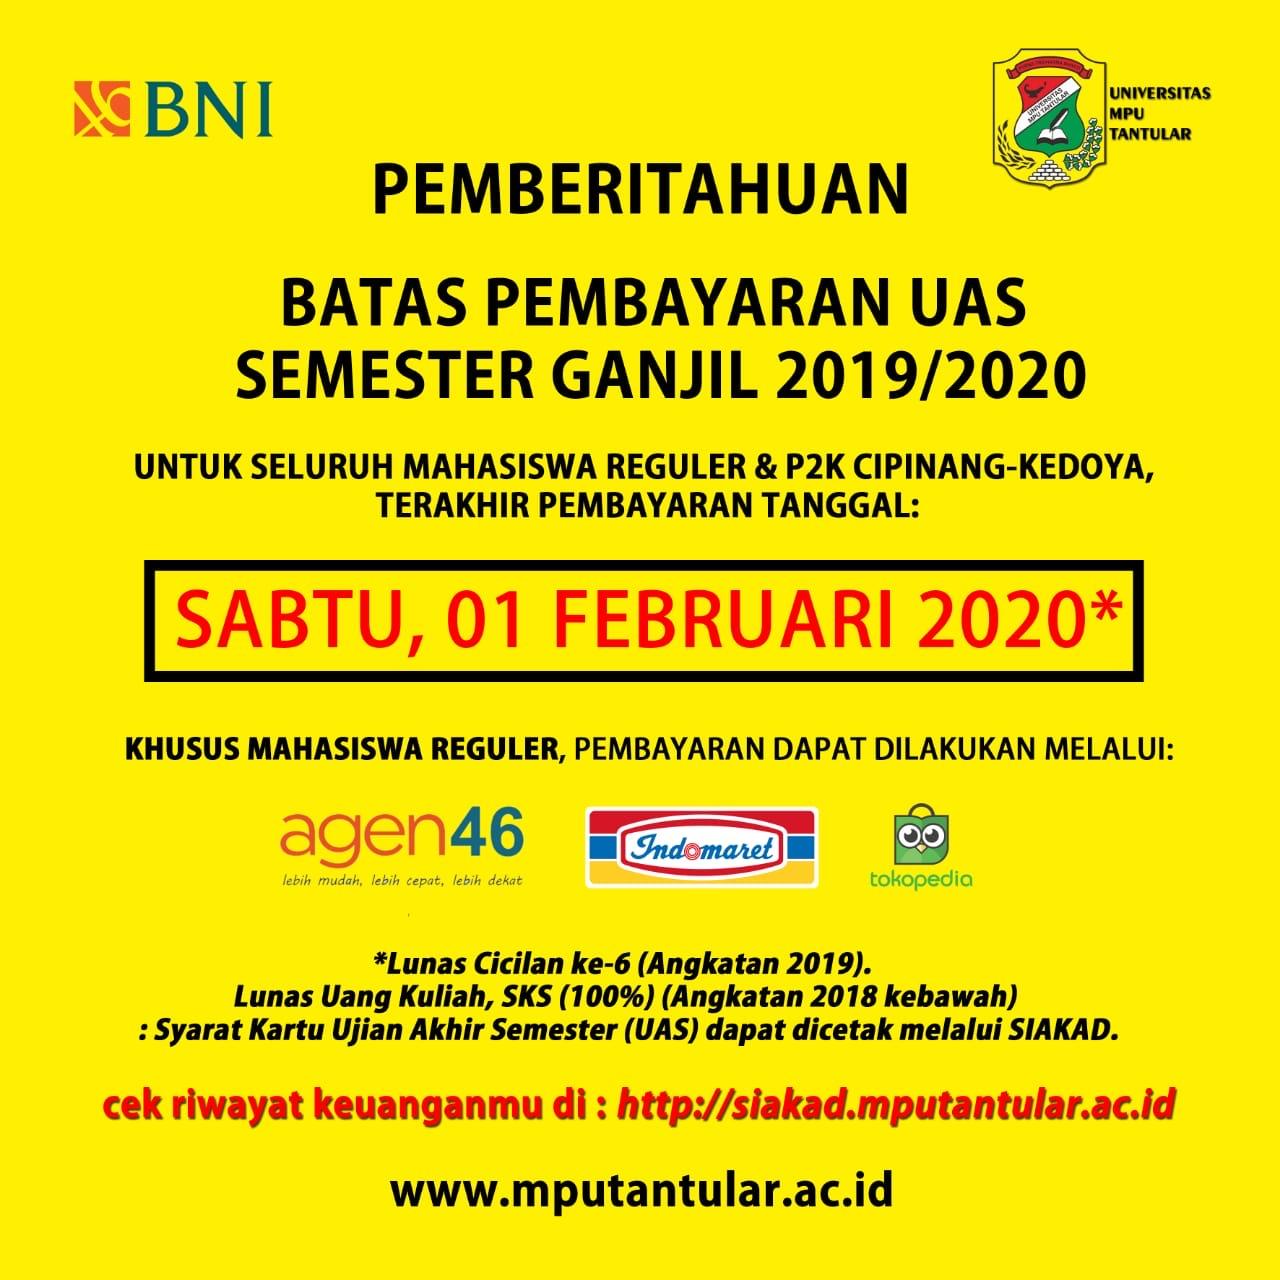 BATAS PEMBAYARAN UAS SEMESTER GANJIL 2019-2020